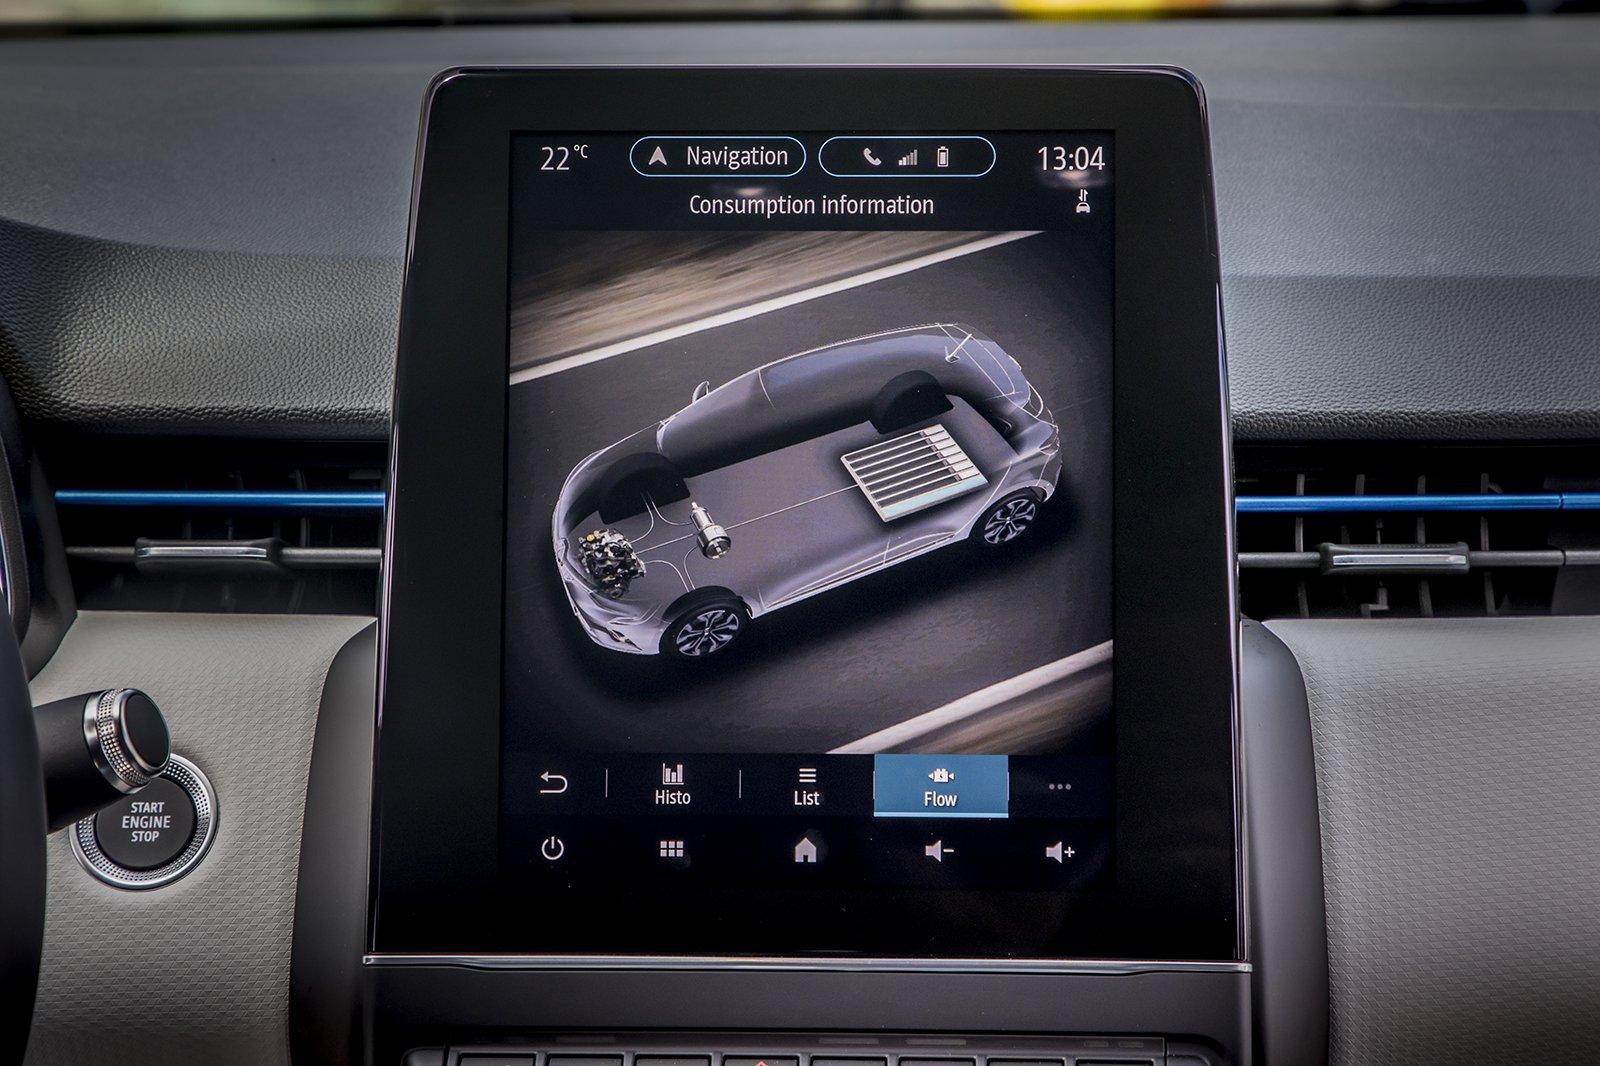 Renault Clio 2020 LHD infotainment